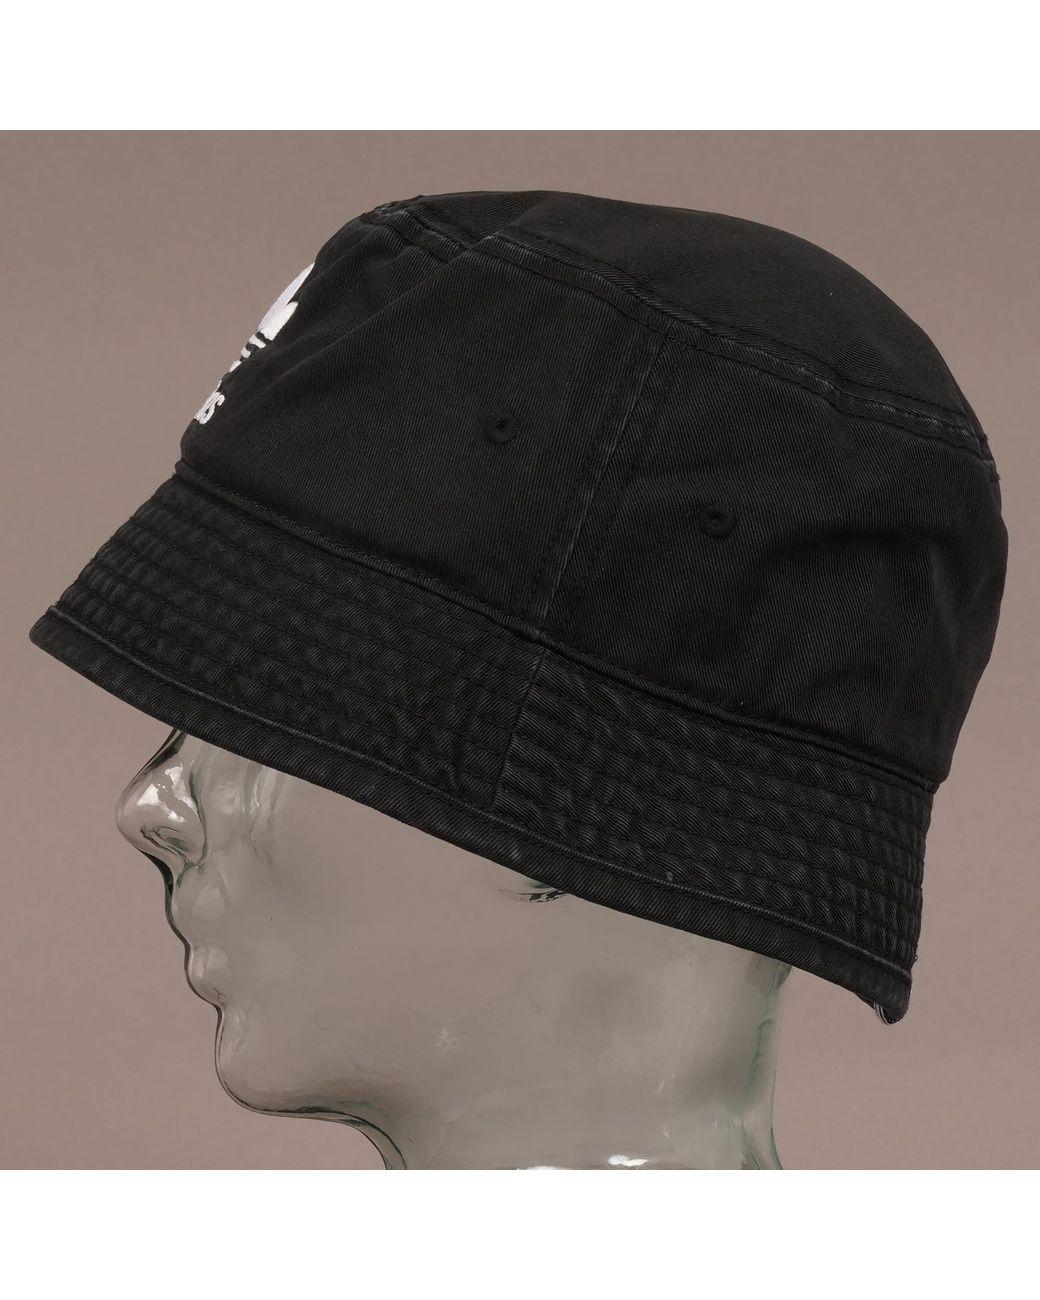 c7aa443fc03 adidas Originals Trefoil Bucket Hat - Black in Black for Men - Lyst